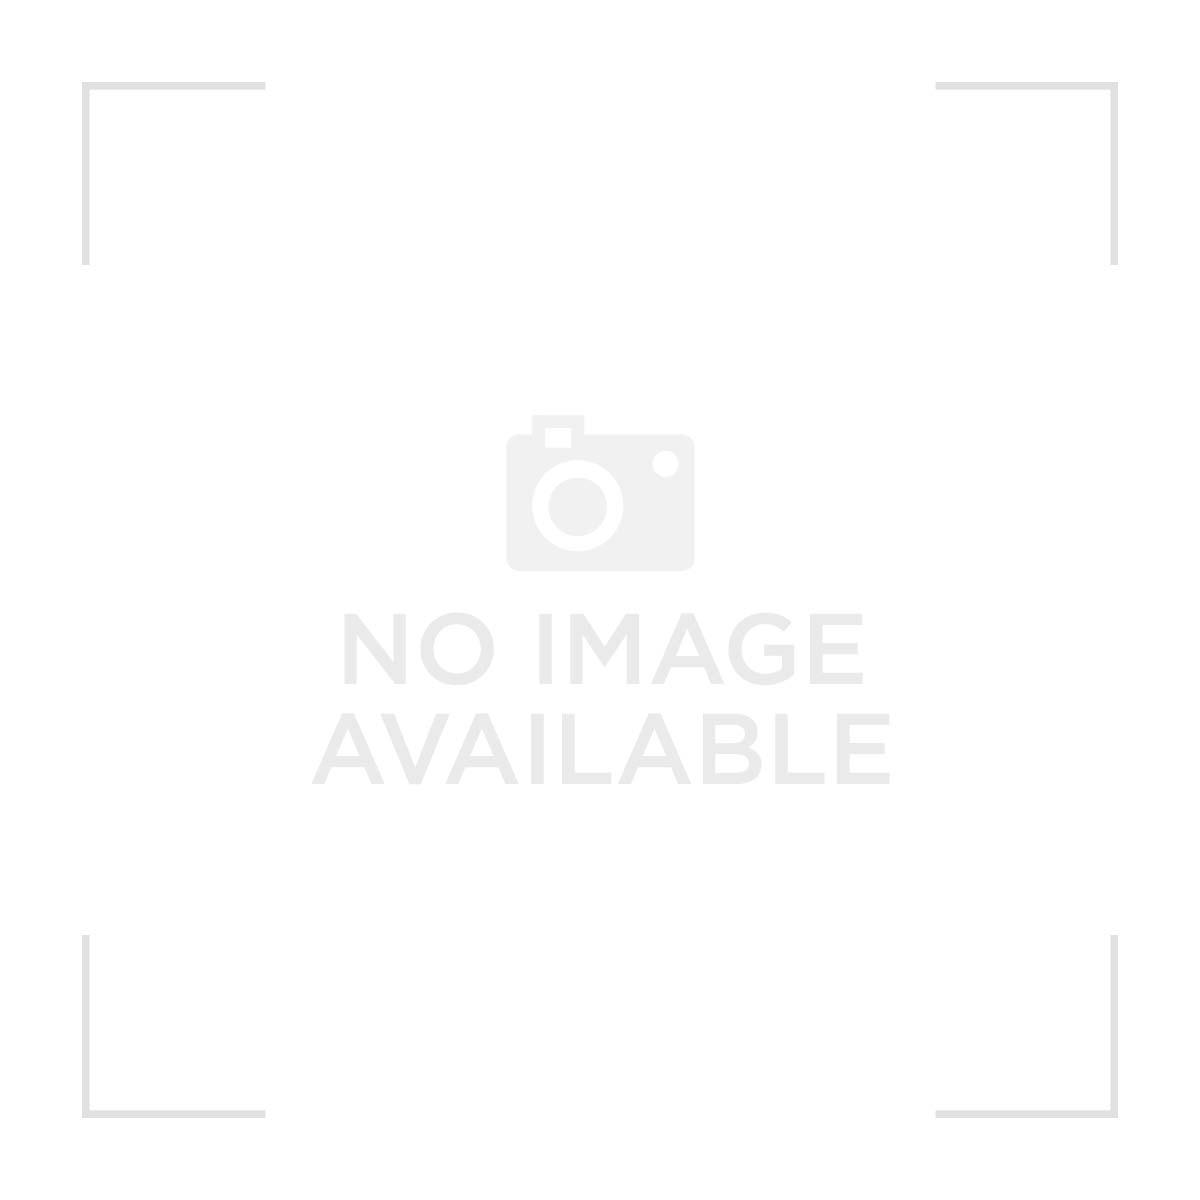 Capresso Infinty Commercial Grade Conical Burr Grinder Brushed Stainless Steel